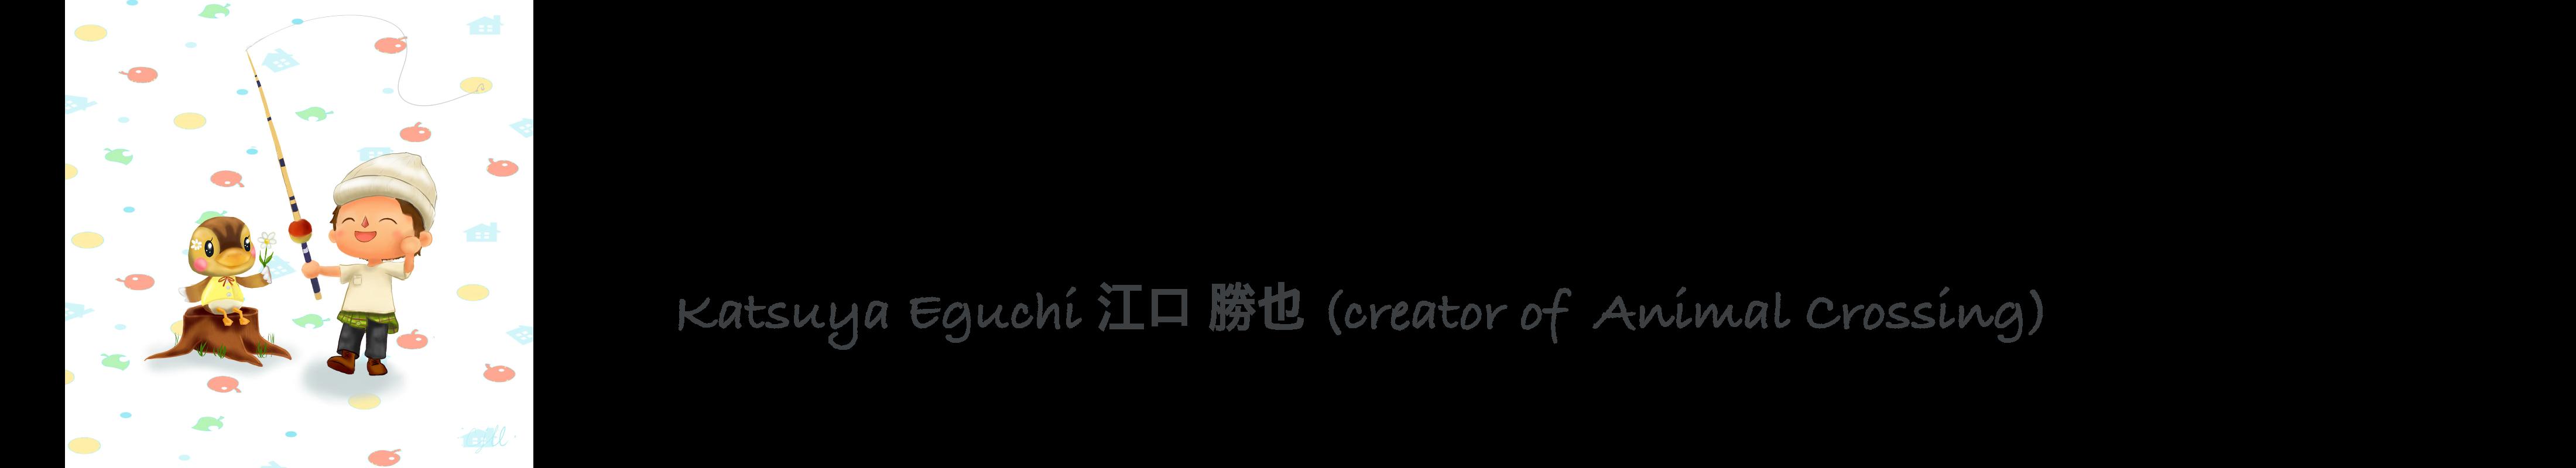 CrossingCharmHeader: A Quote by Katsuya Eguchi